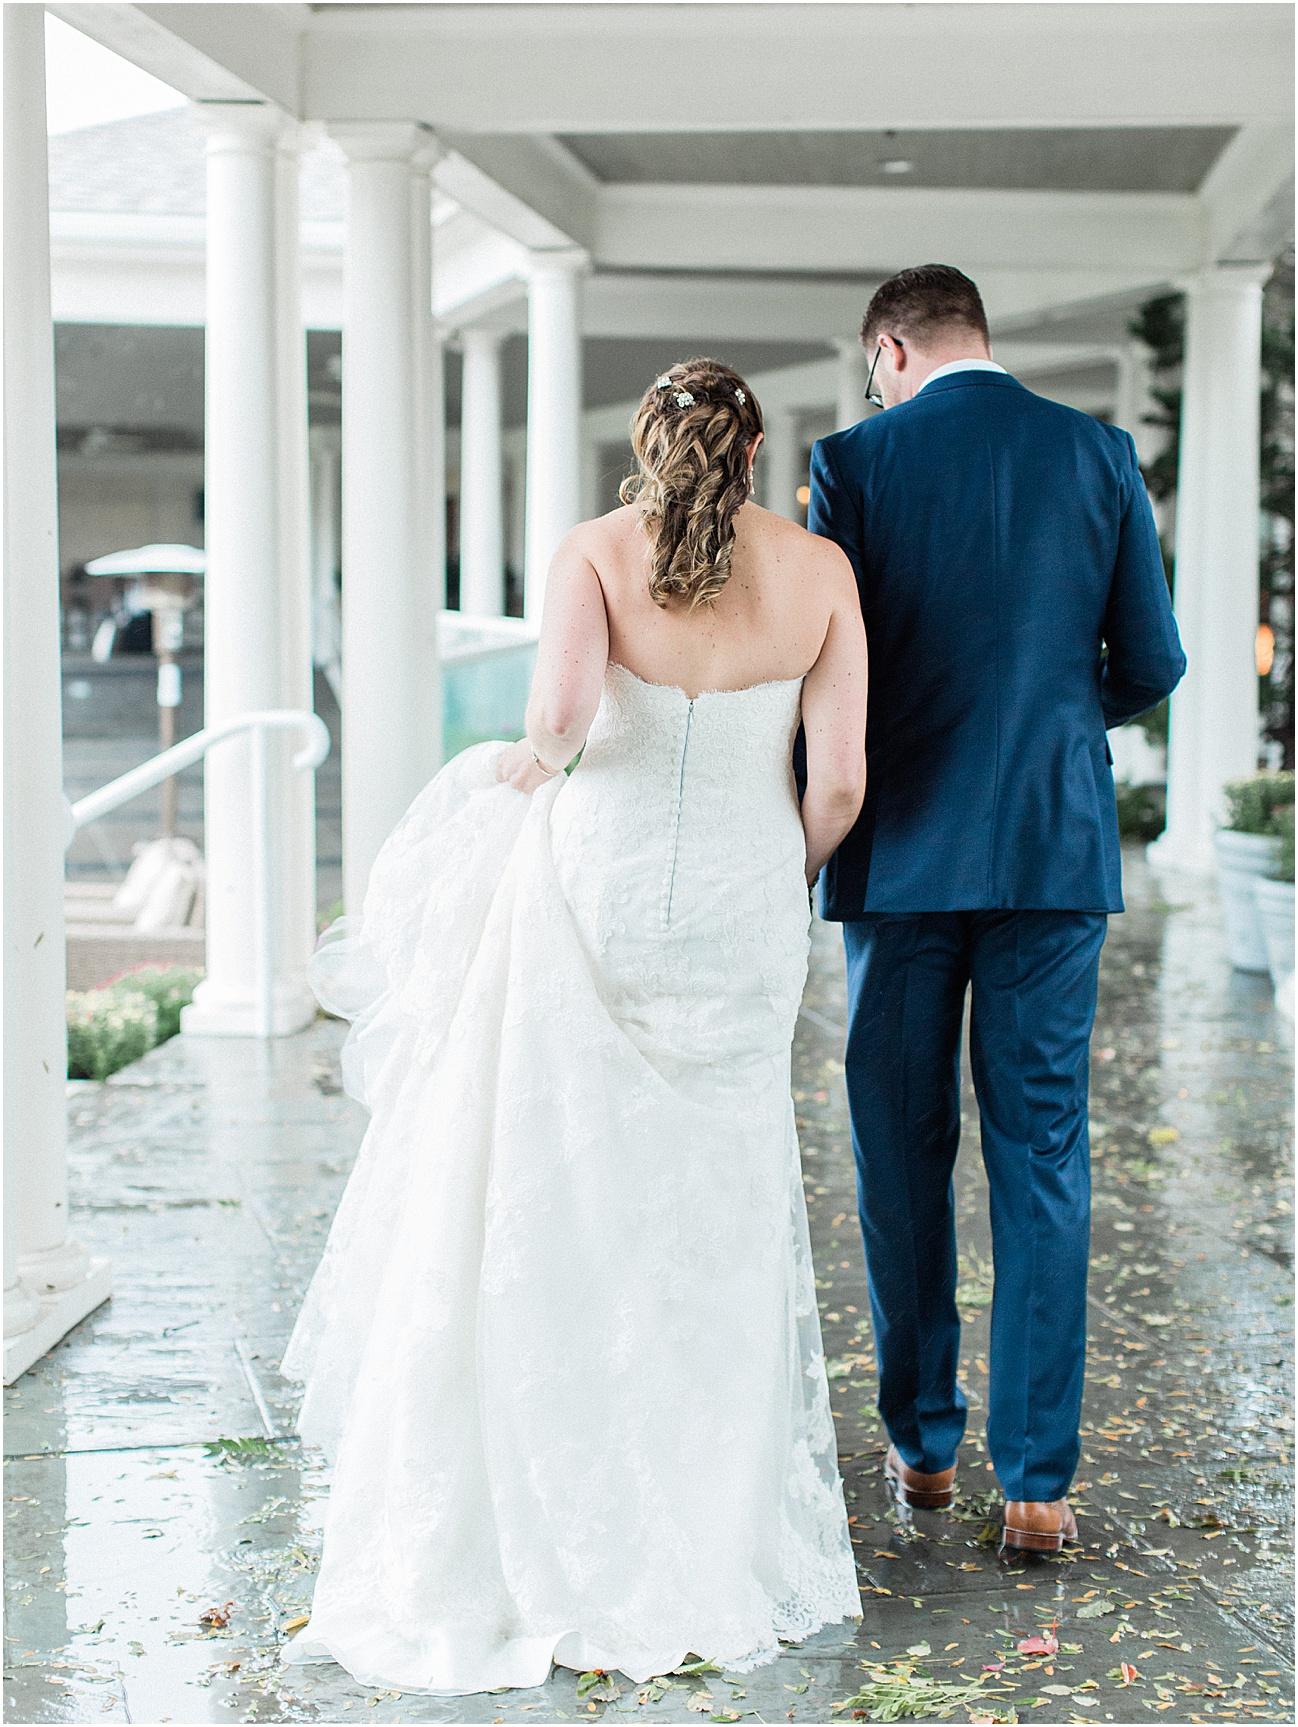 danielle_sean_willowbend_rain_rainy_day_cape_cod_boston_wedding_photographer_meredith_jane_photography_photo_1678.jpg